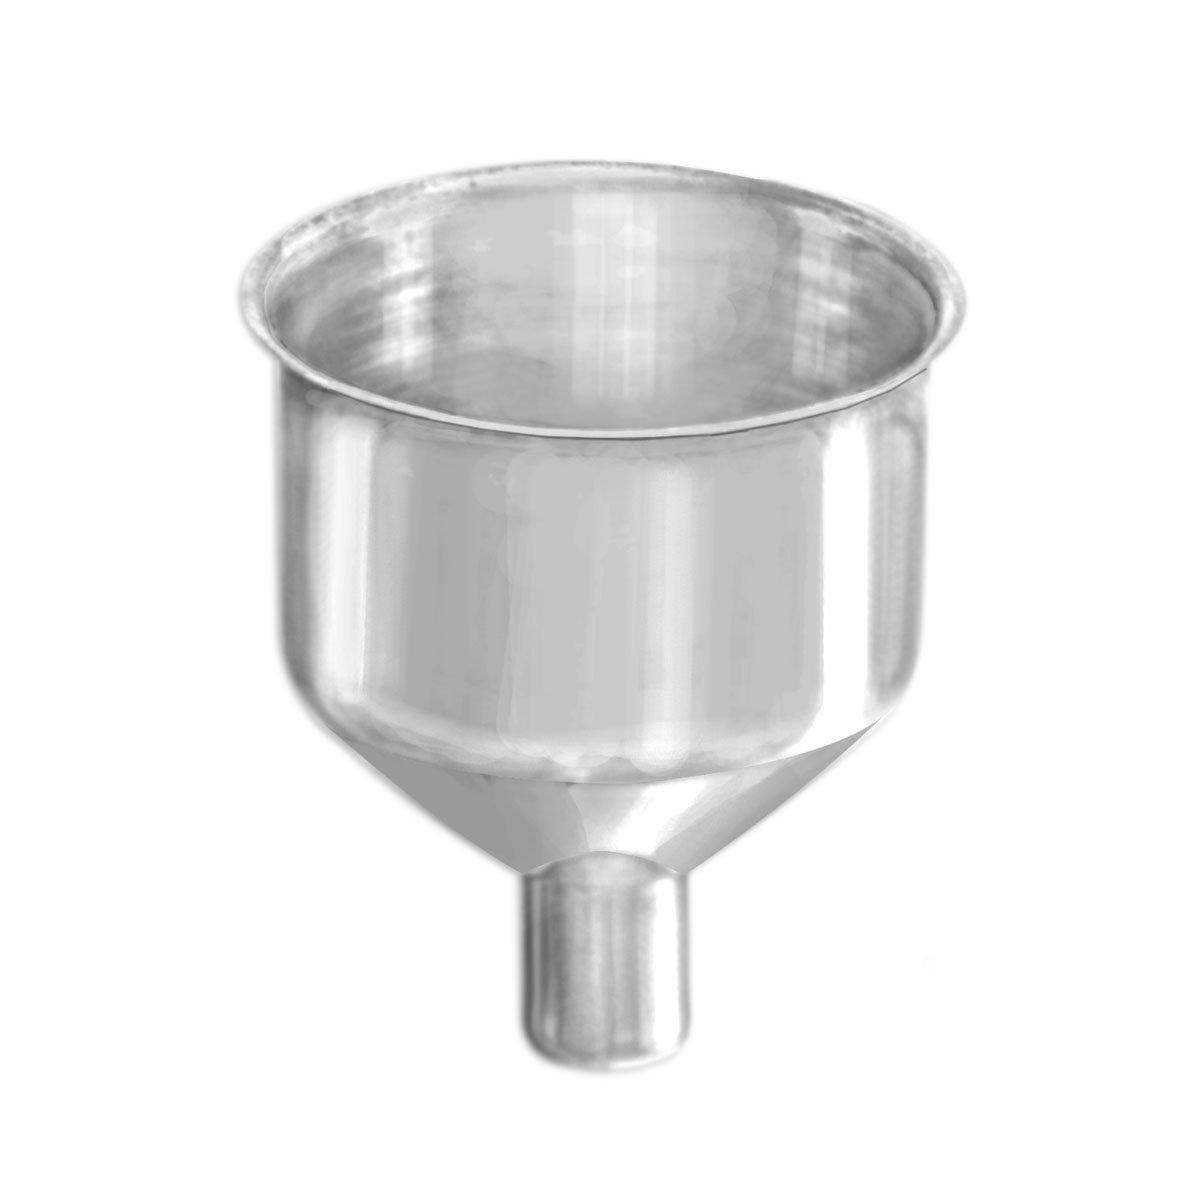 Amazon.com: Femitu Mini Stainless Steel Funnel - Spices, Seeds ...